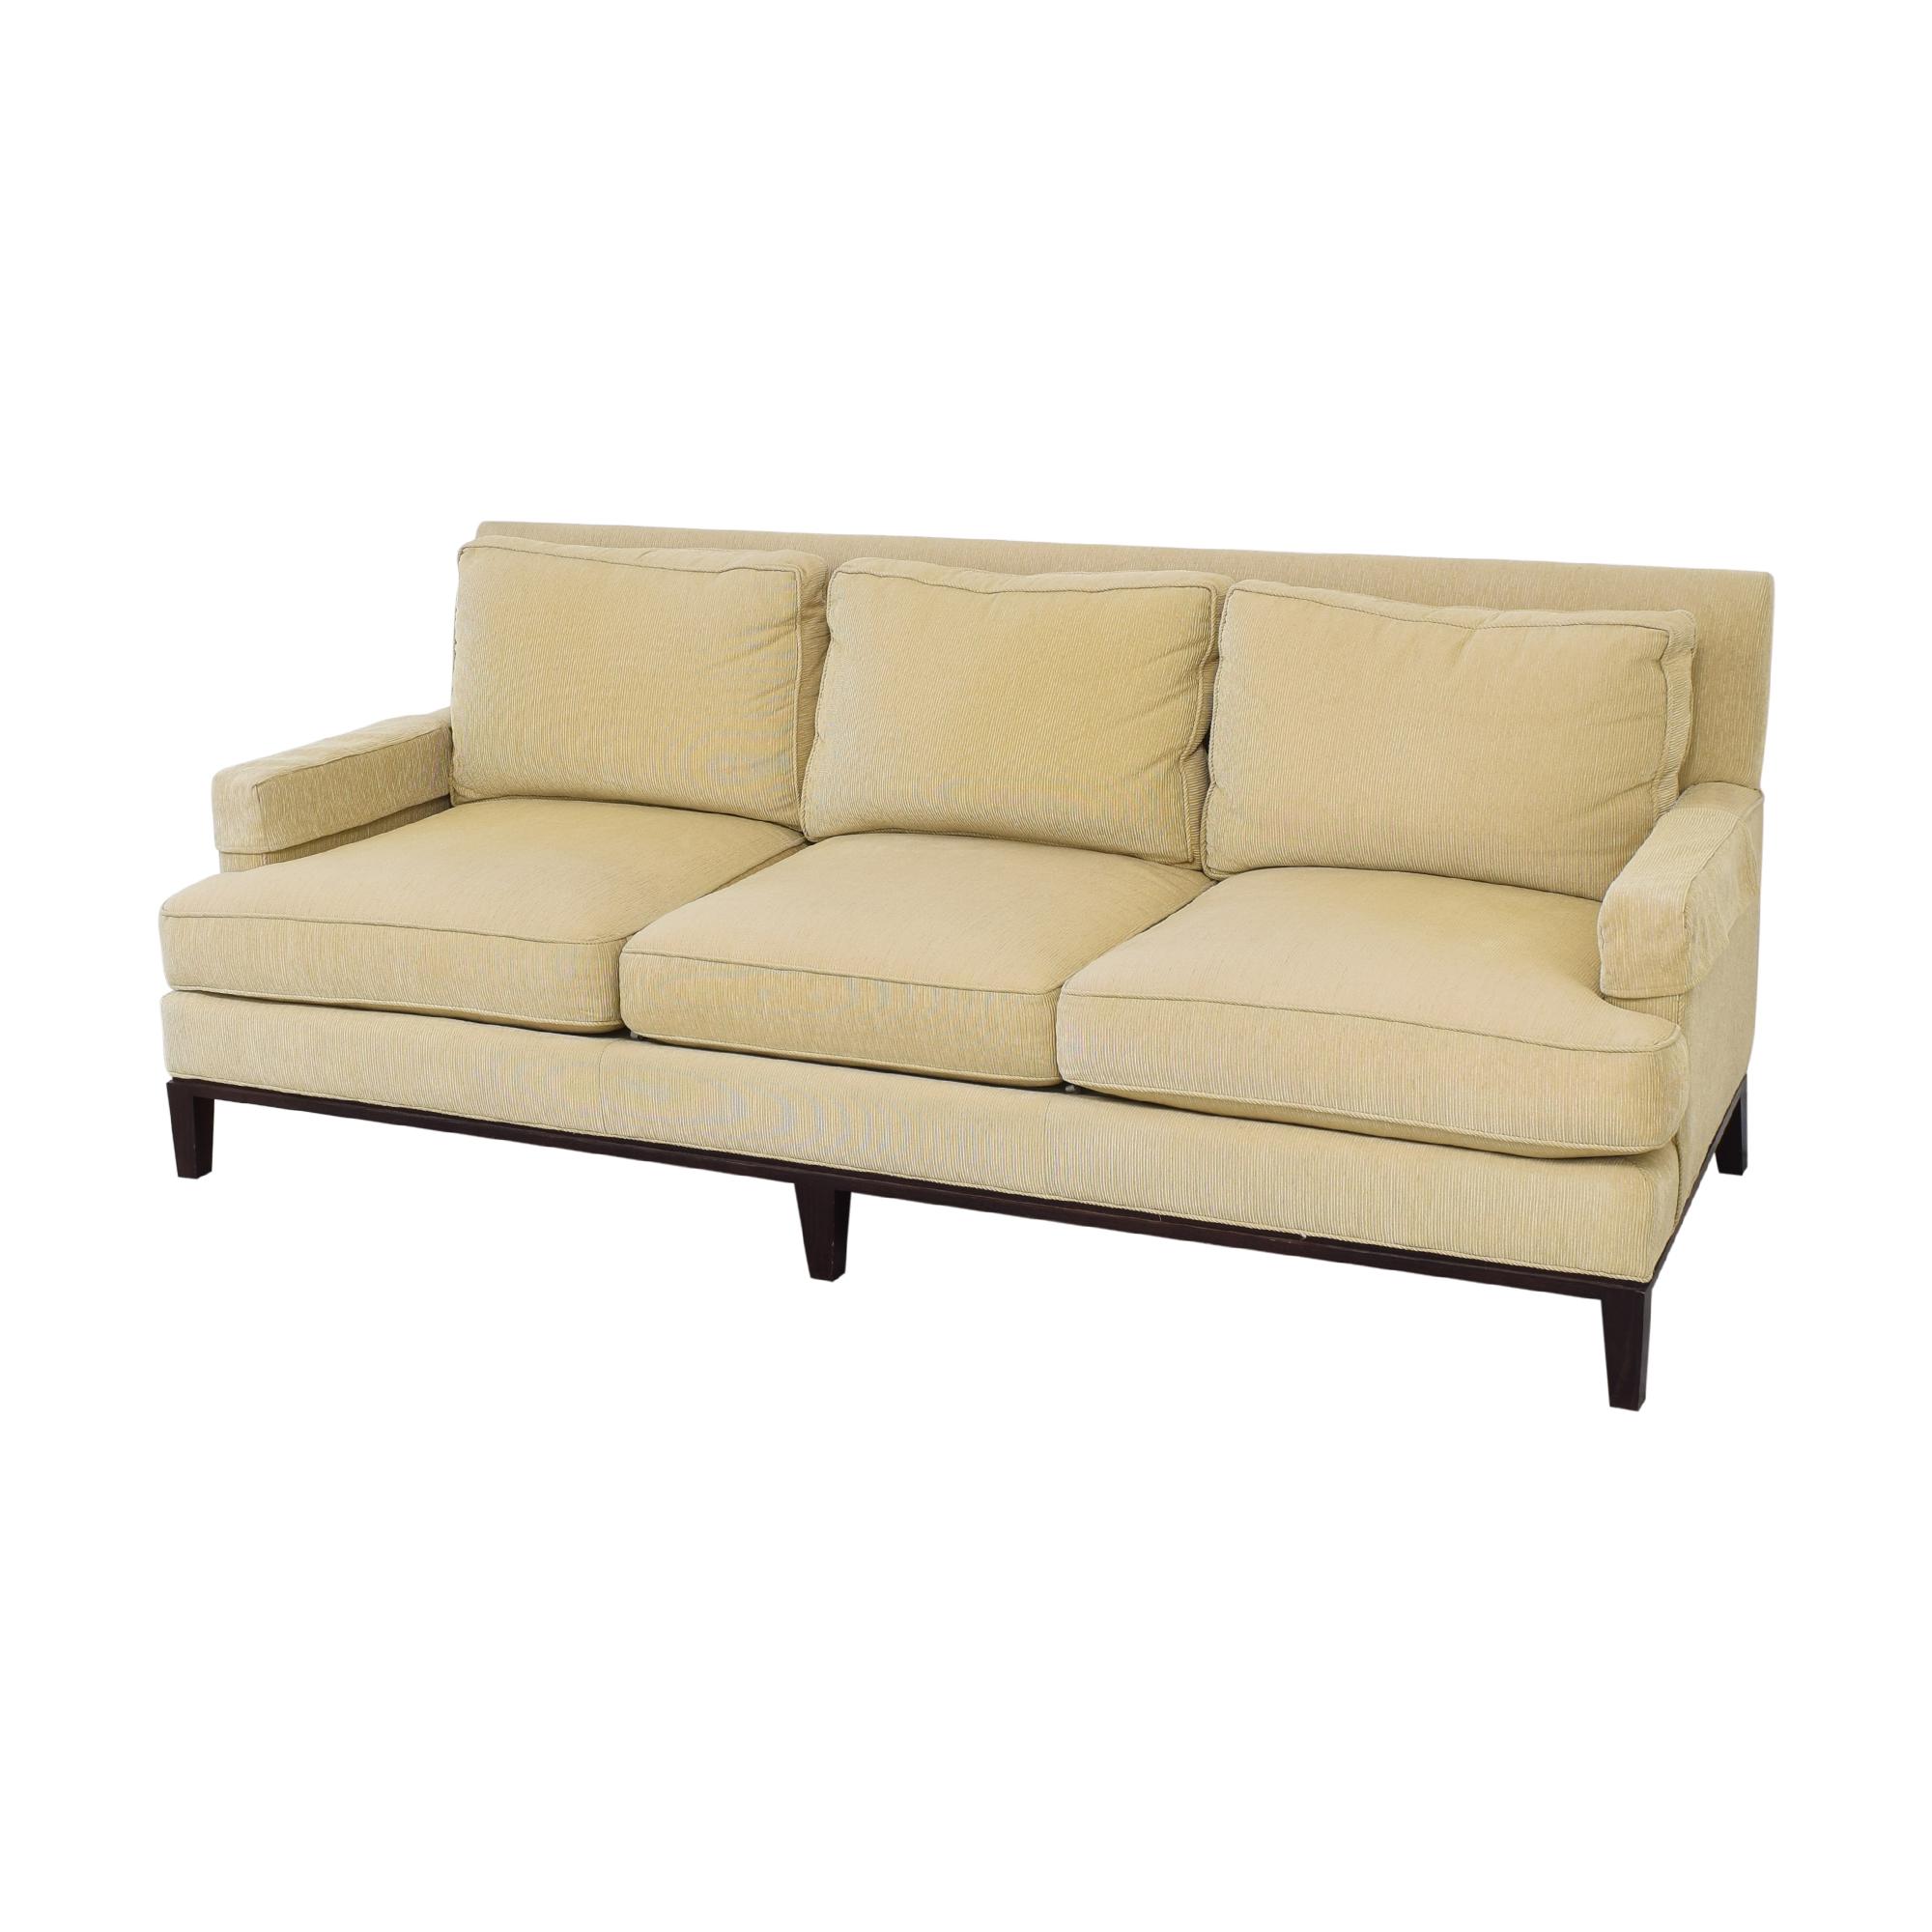 shop Vanguard Furniture Vanguard Furniture Sterling Sofa online